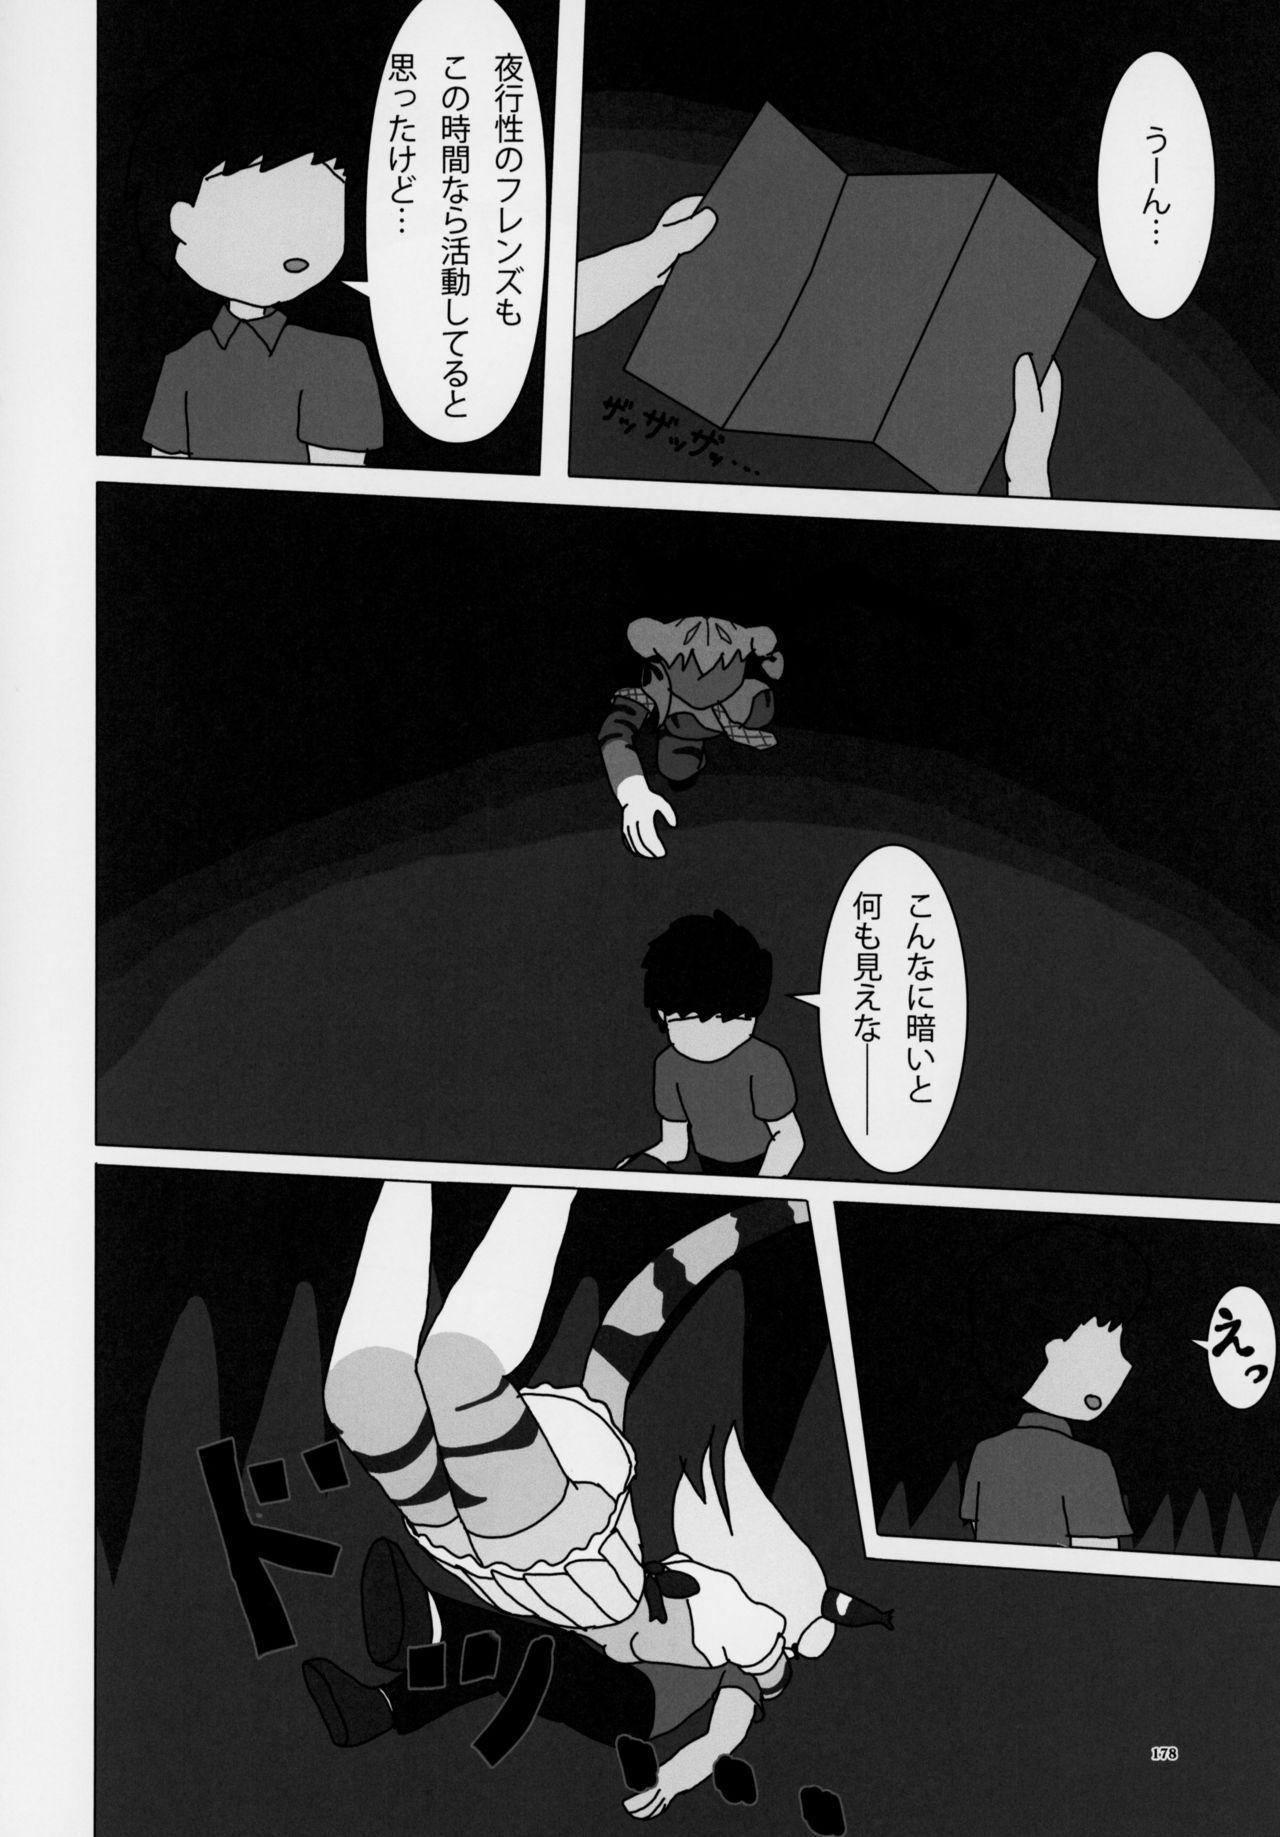 Friends Gyaku Rape Goudoushi 176